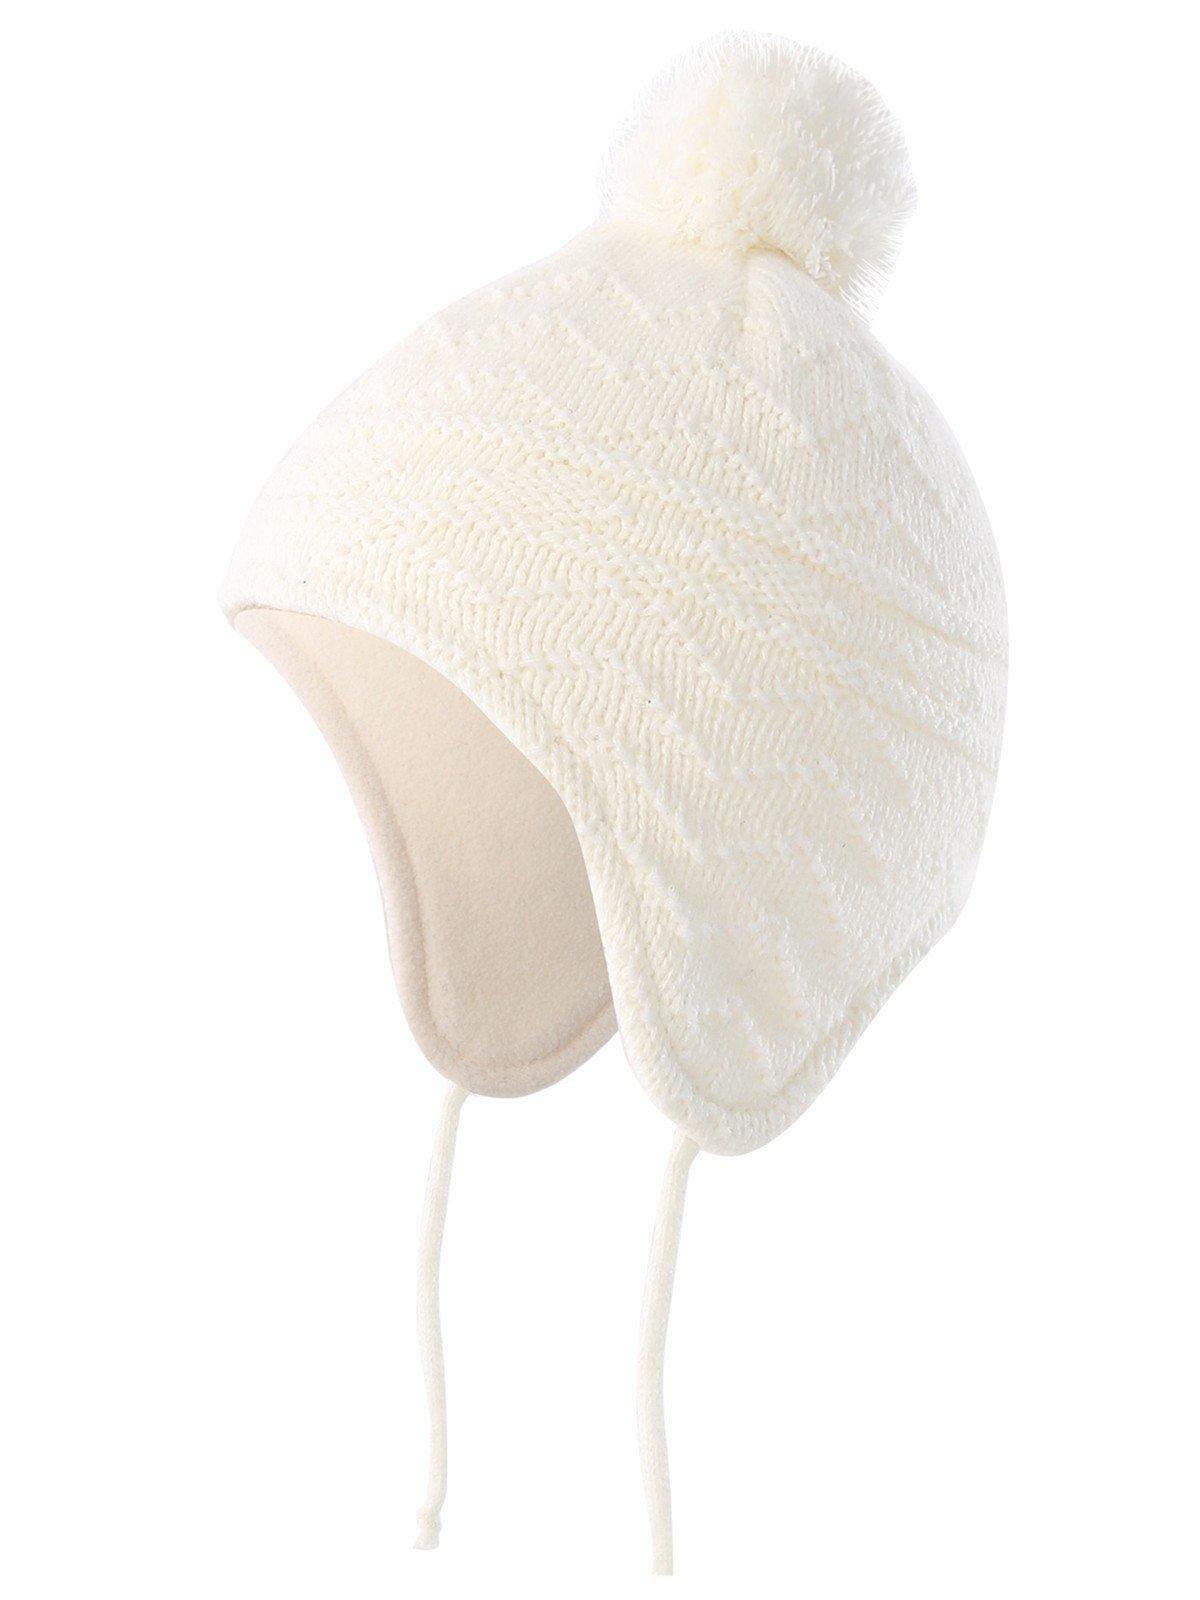 Baby Toddler Fleece Lined Winter Earflap Beanie Cream Bear Hat Knit Mittens or Hat /& Mittens Set